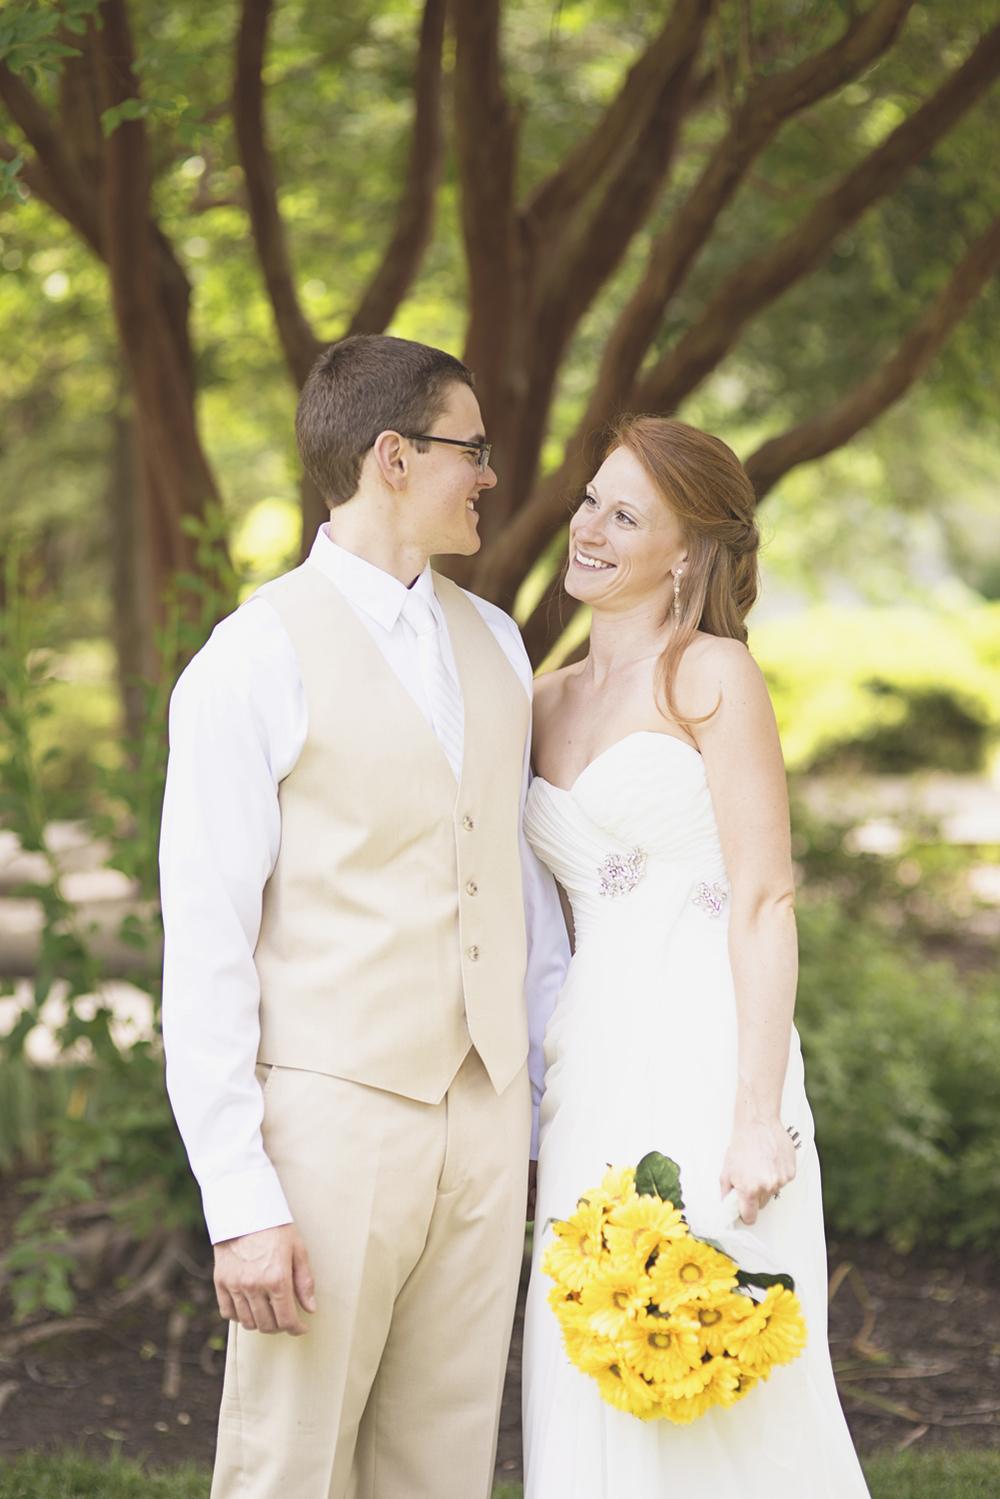 Mariners Museum Wedding | Newport News, Virginia | Bride & groom first look portraits